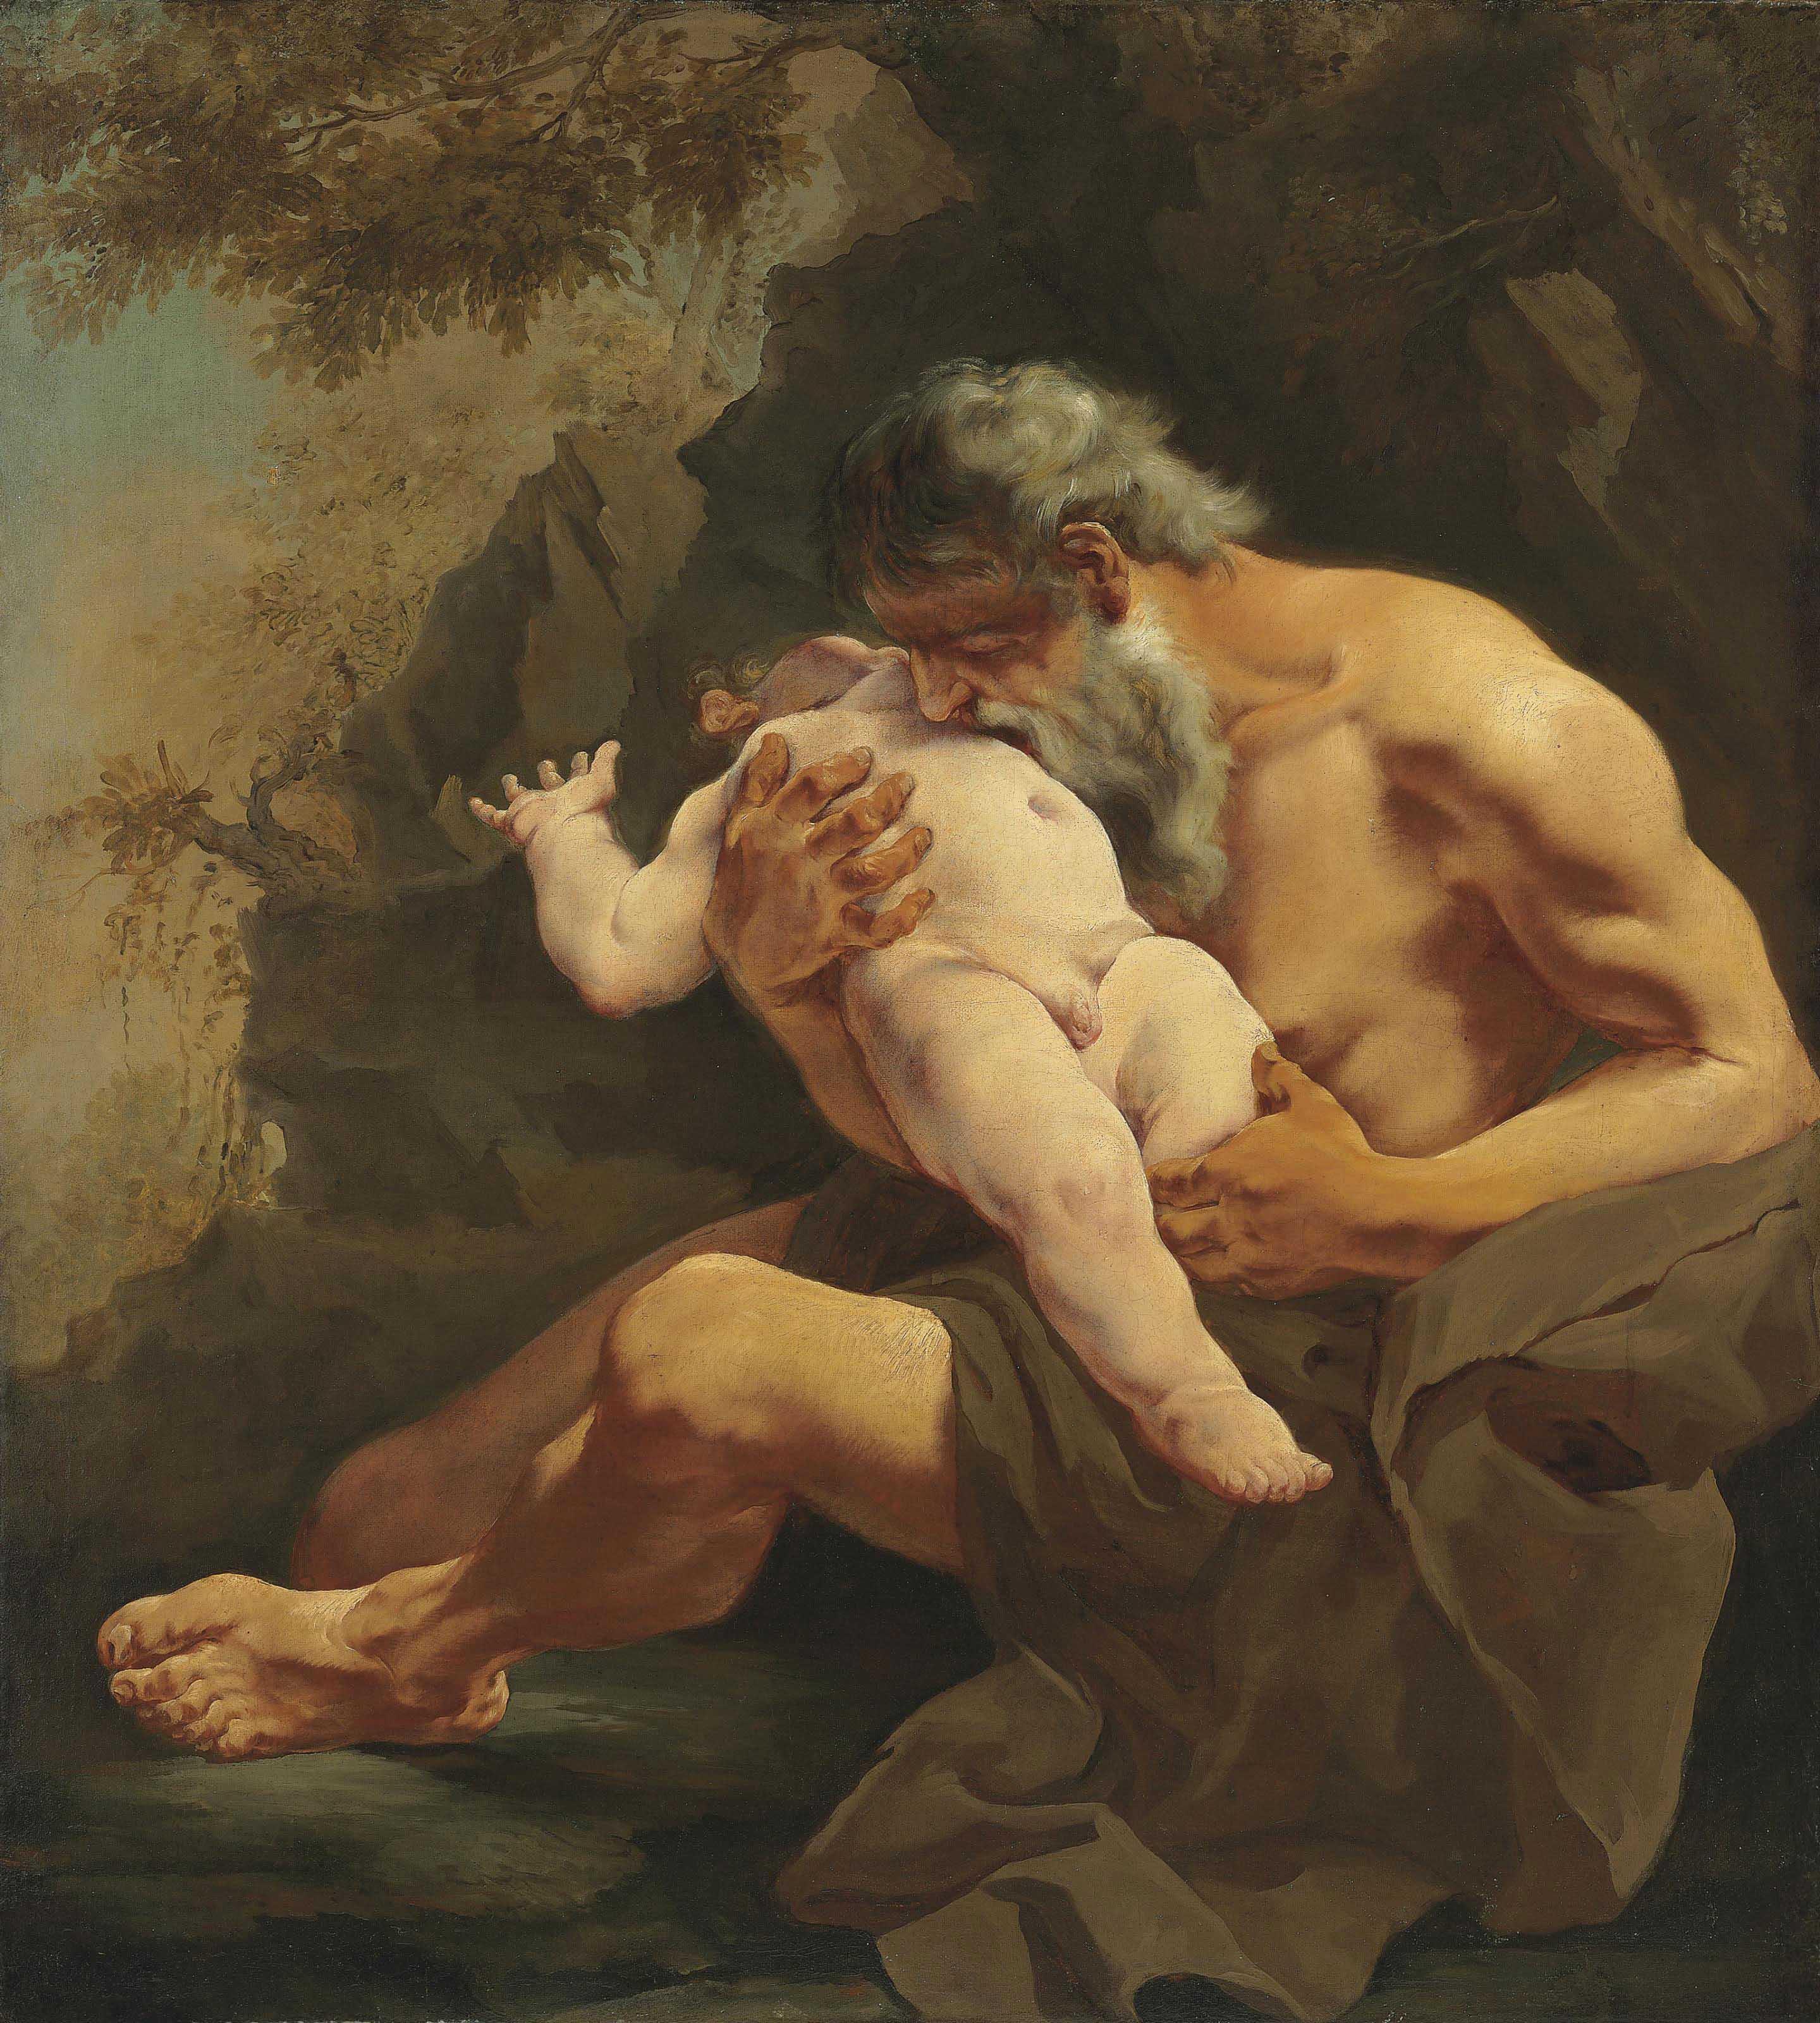 Saturn Devouring his Child